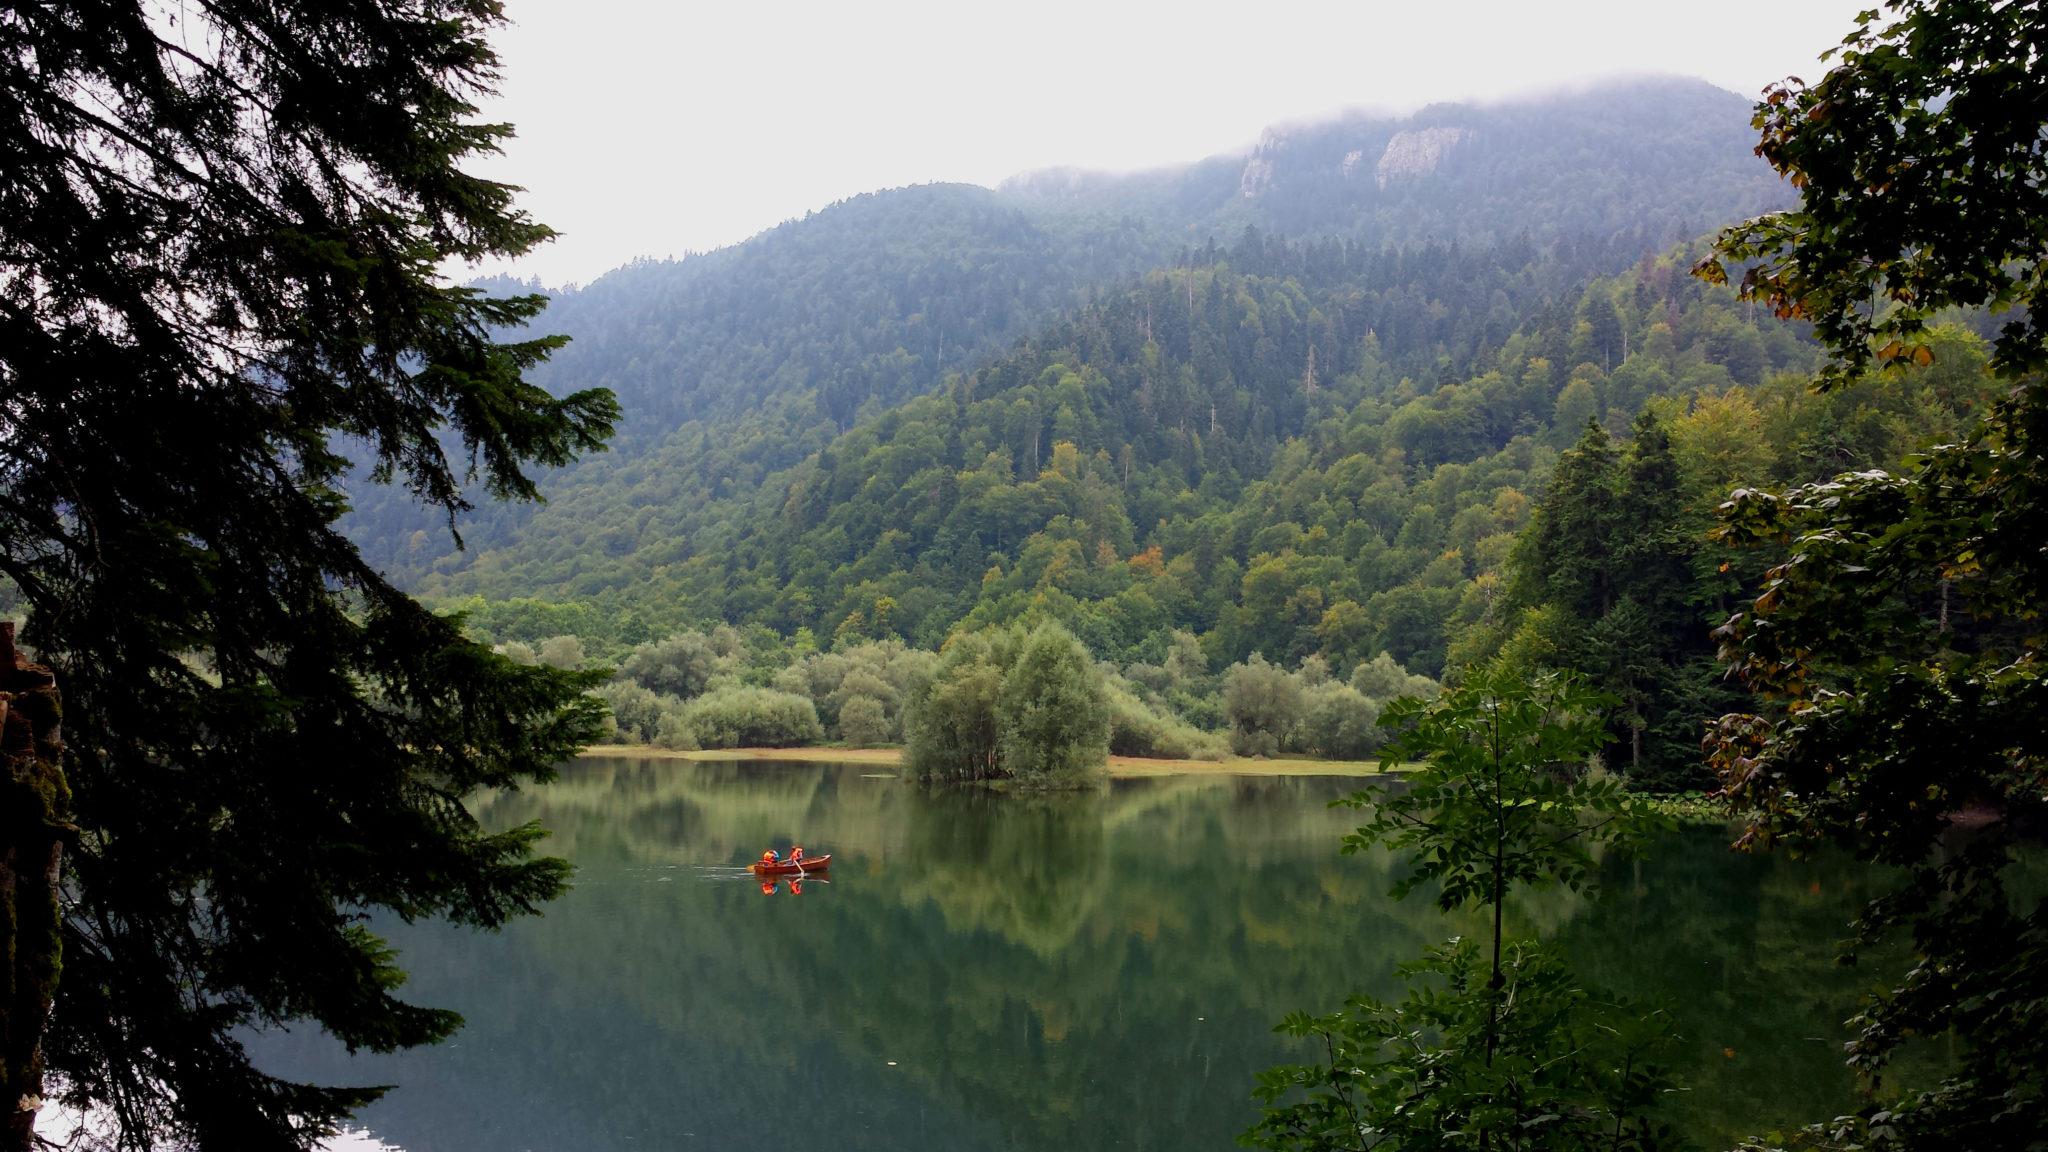 Hema_Montenegro_parc_national_biogradska_gora_forest_travel_voyage_blog6